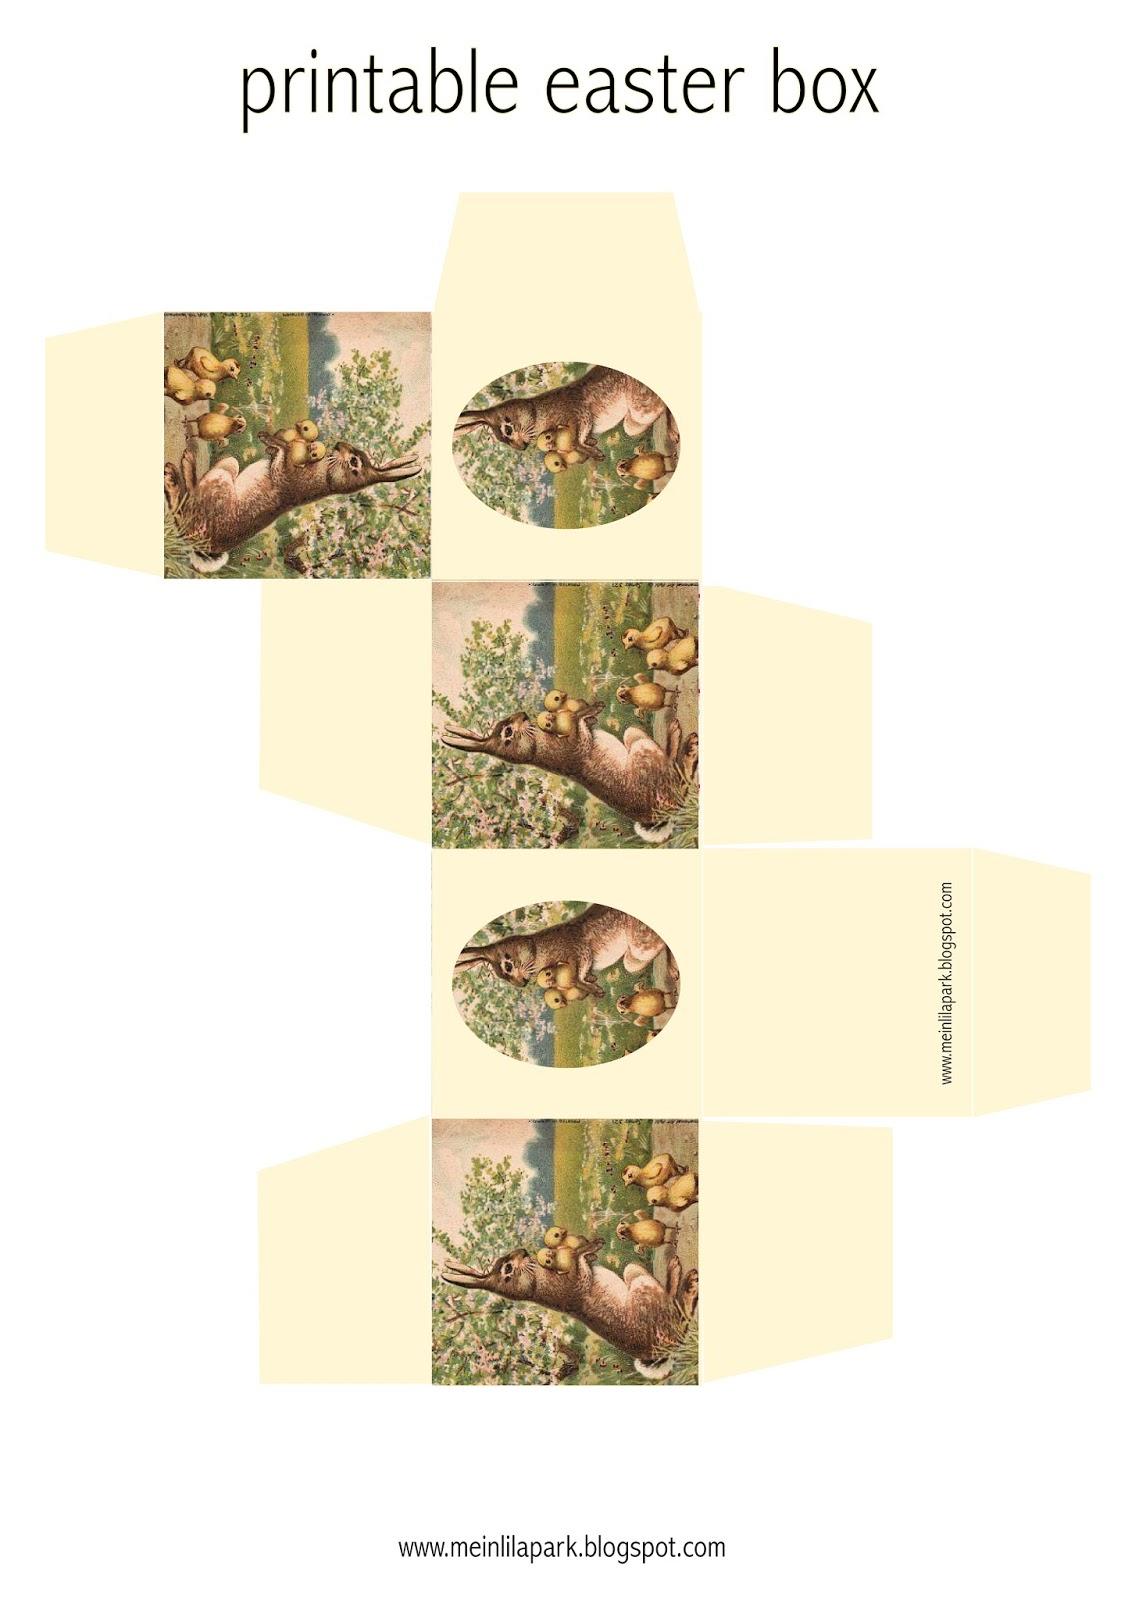 10 Free Printable Easter Box And Diy Templates